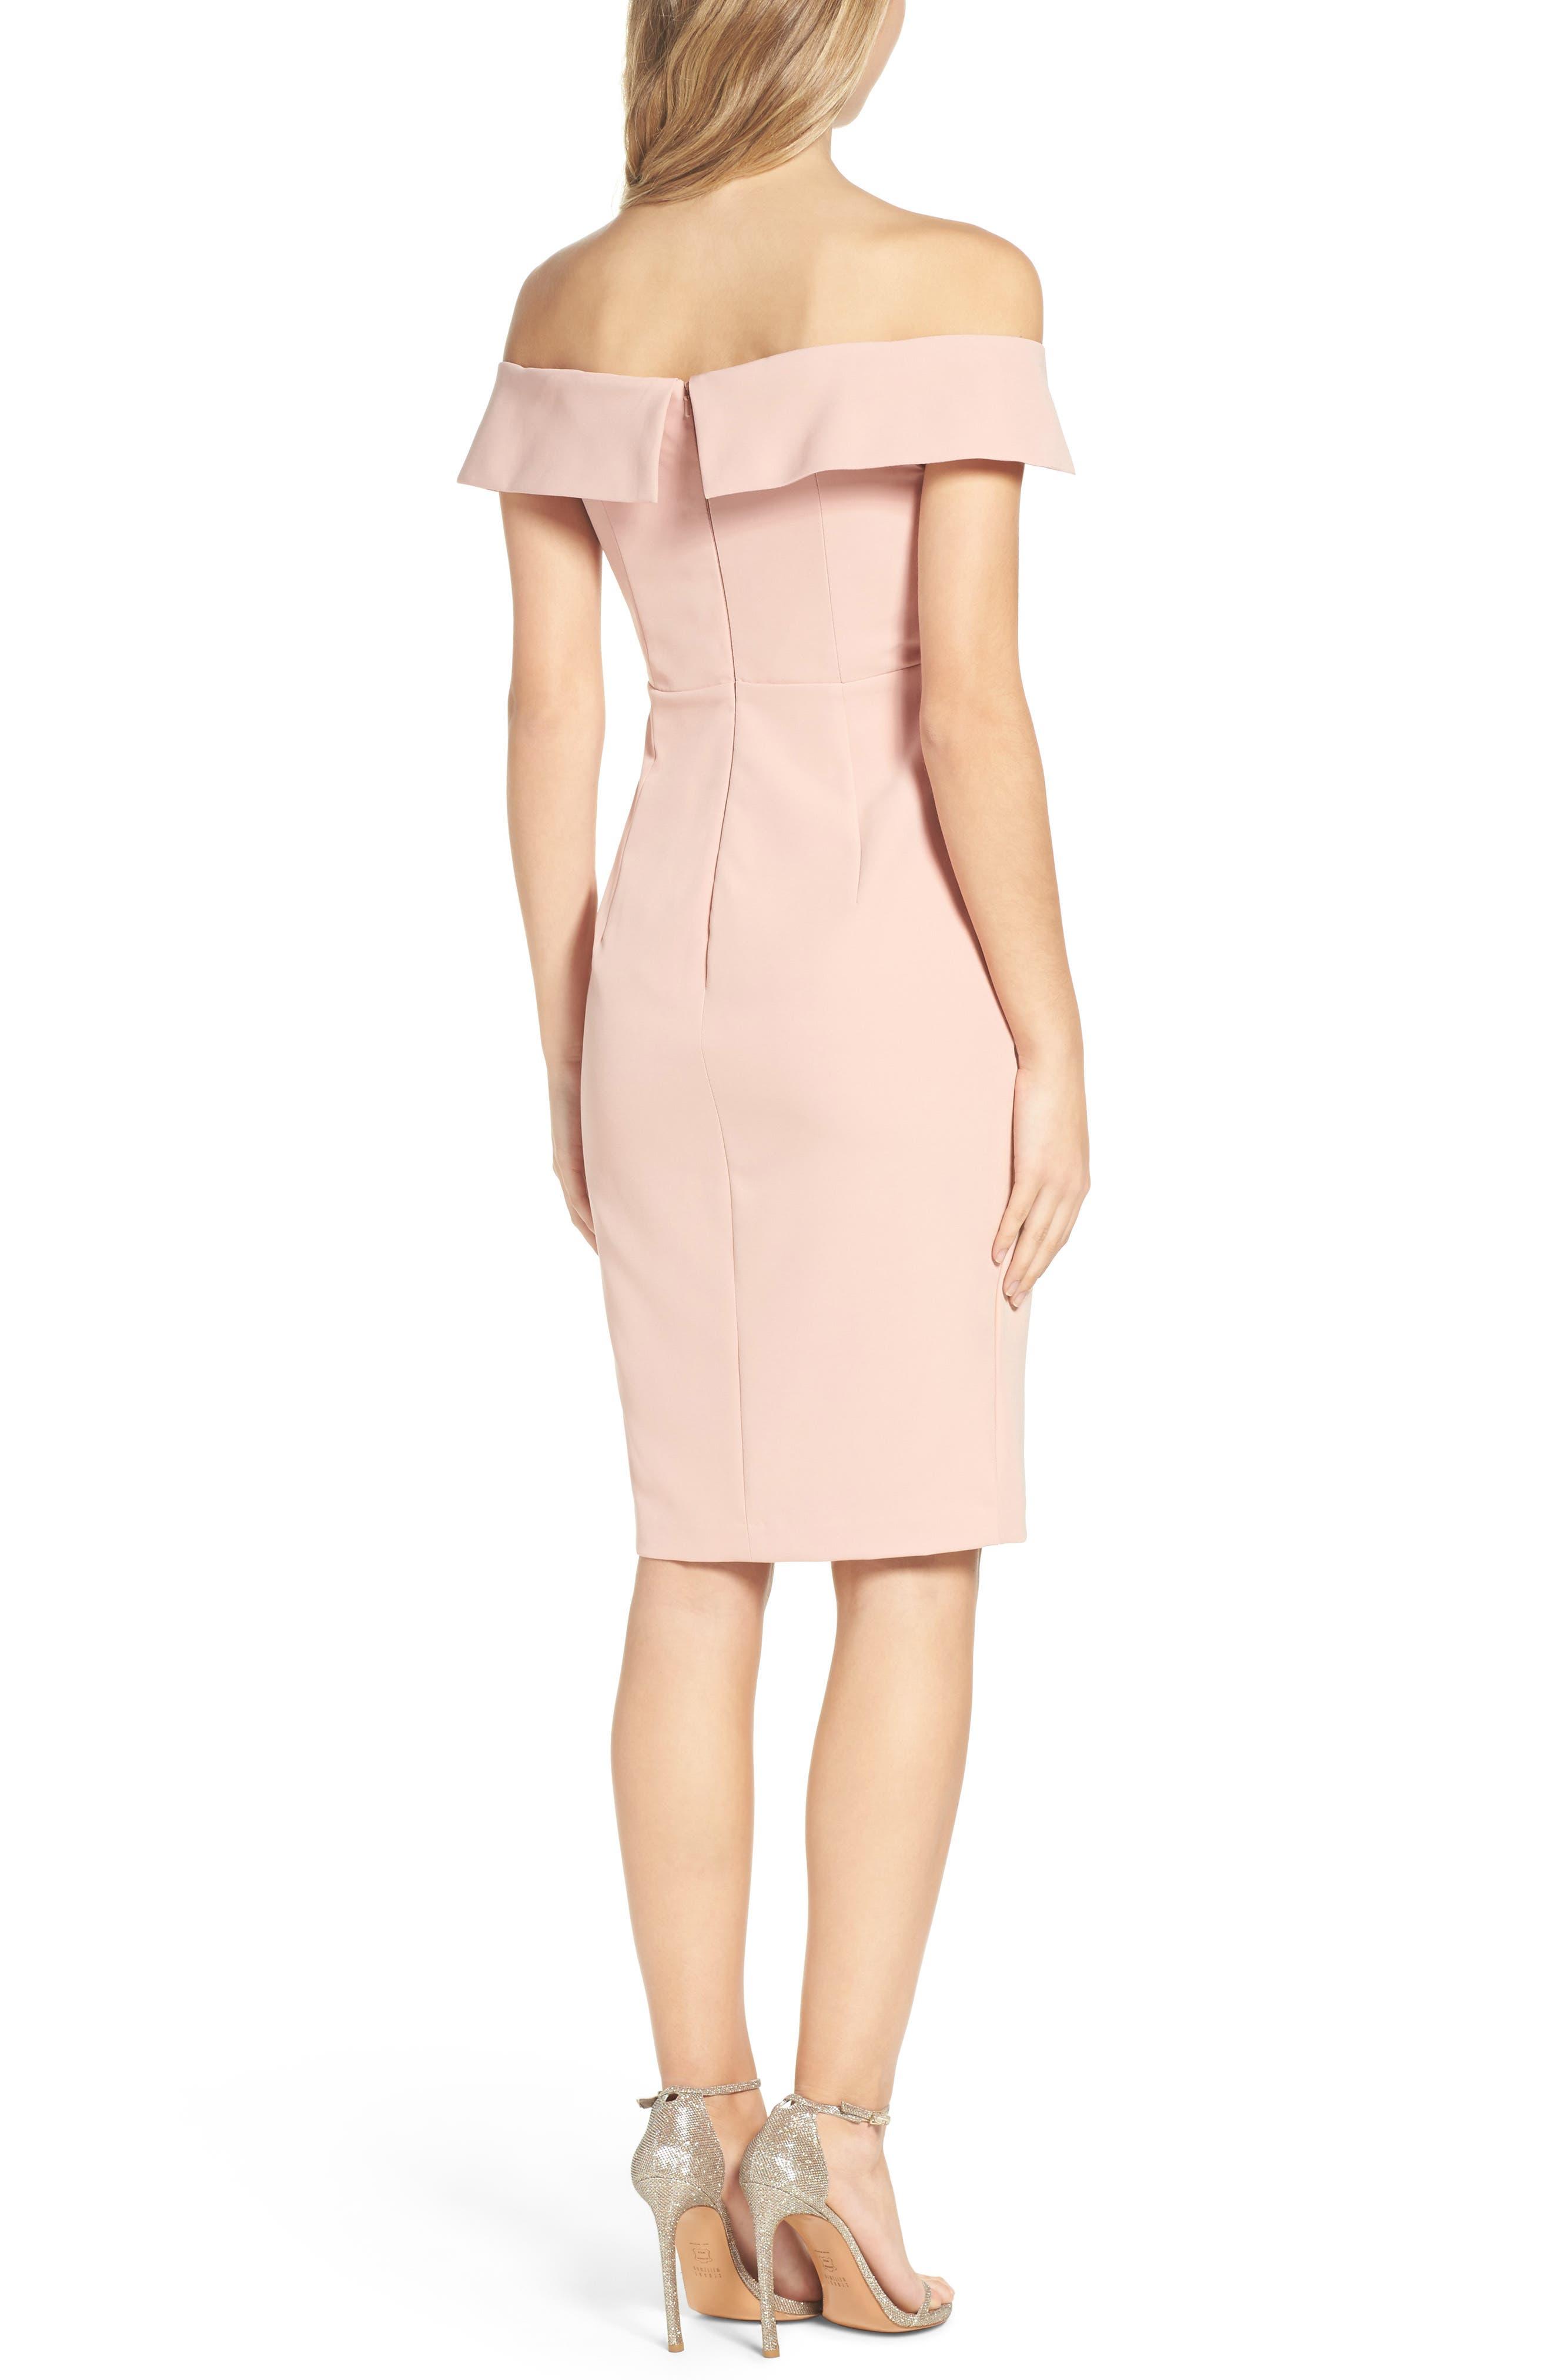 Bella Midi Dress,                             Alternate thumbnail 2, color,                             250